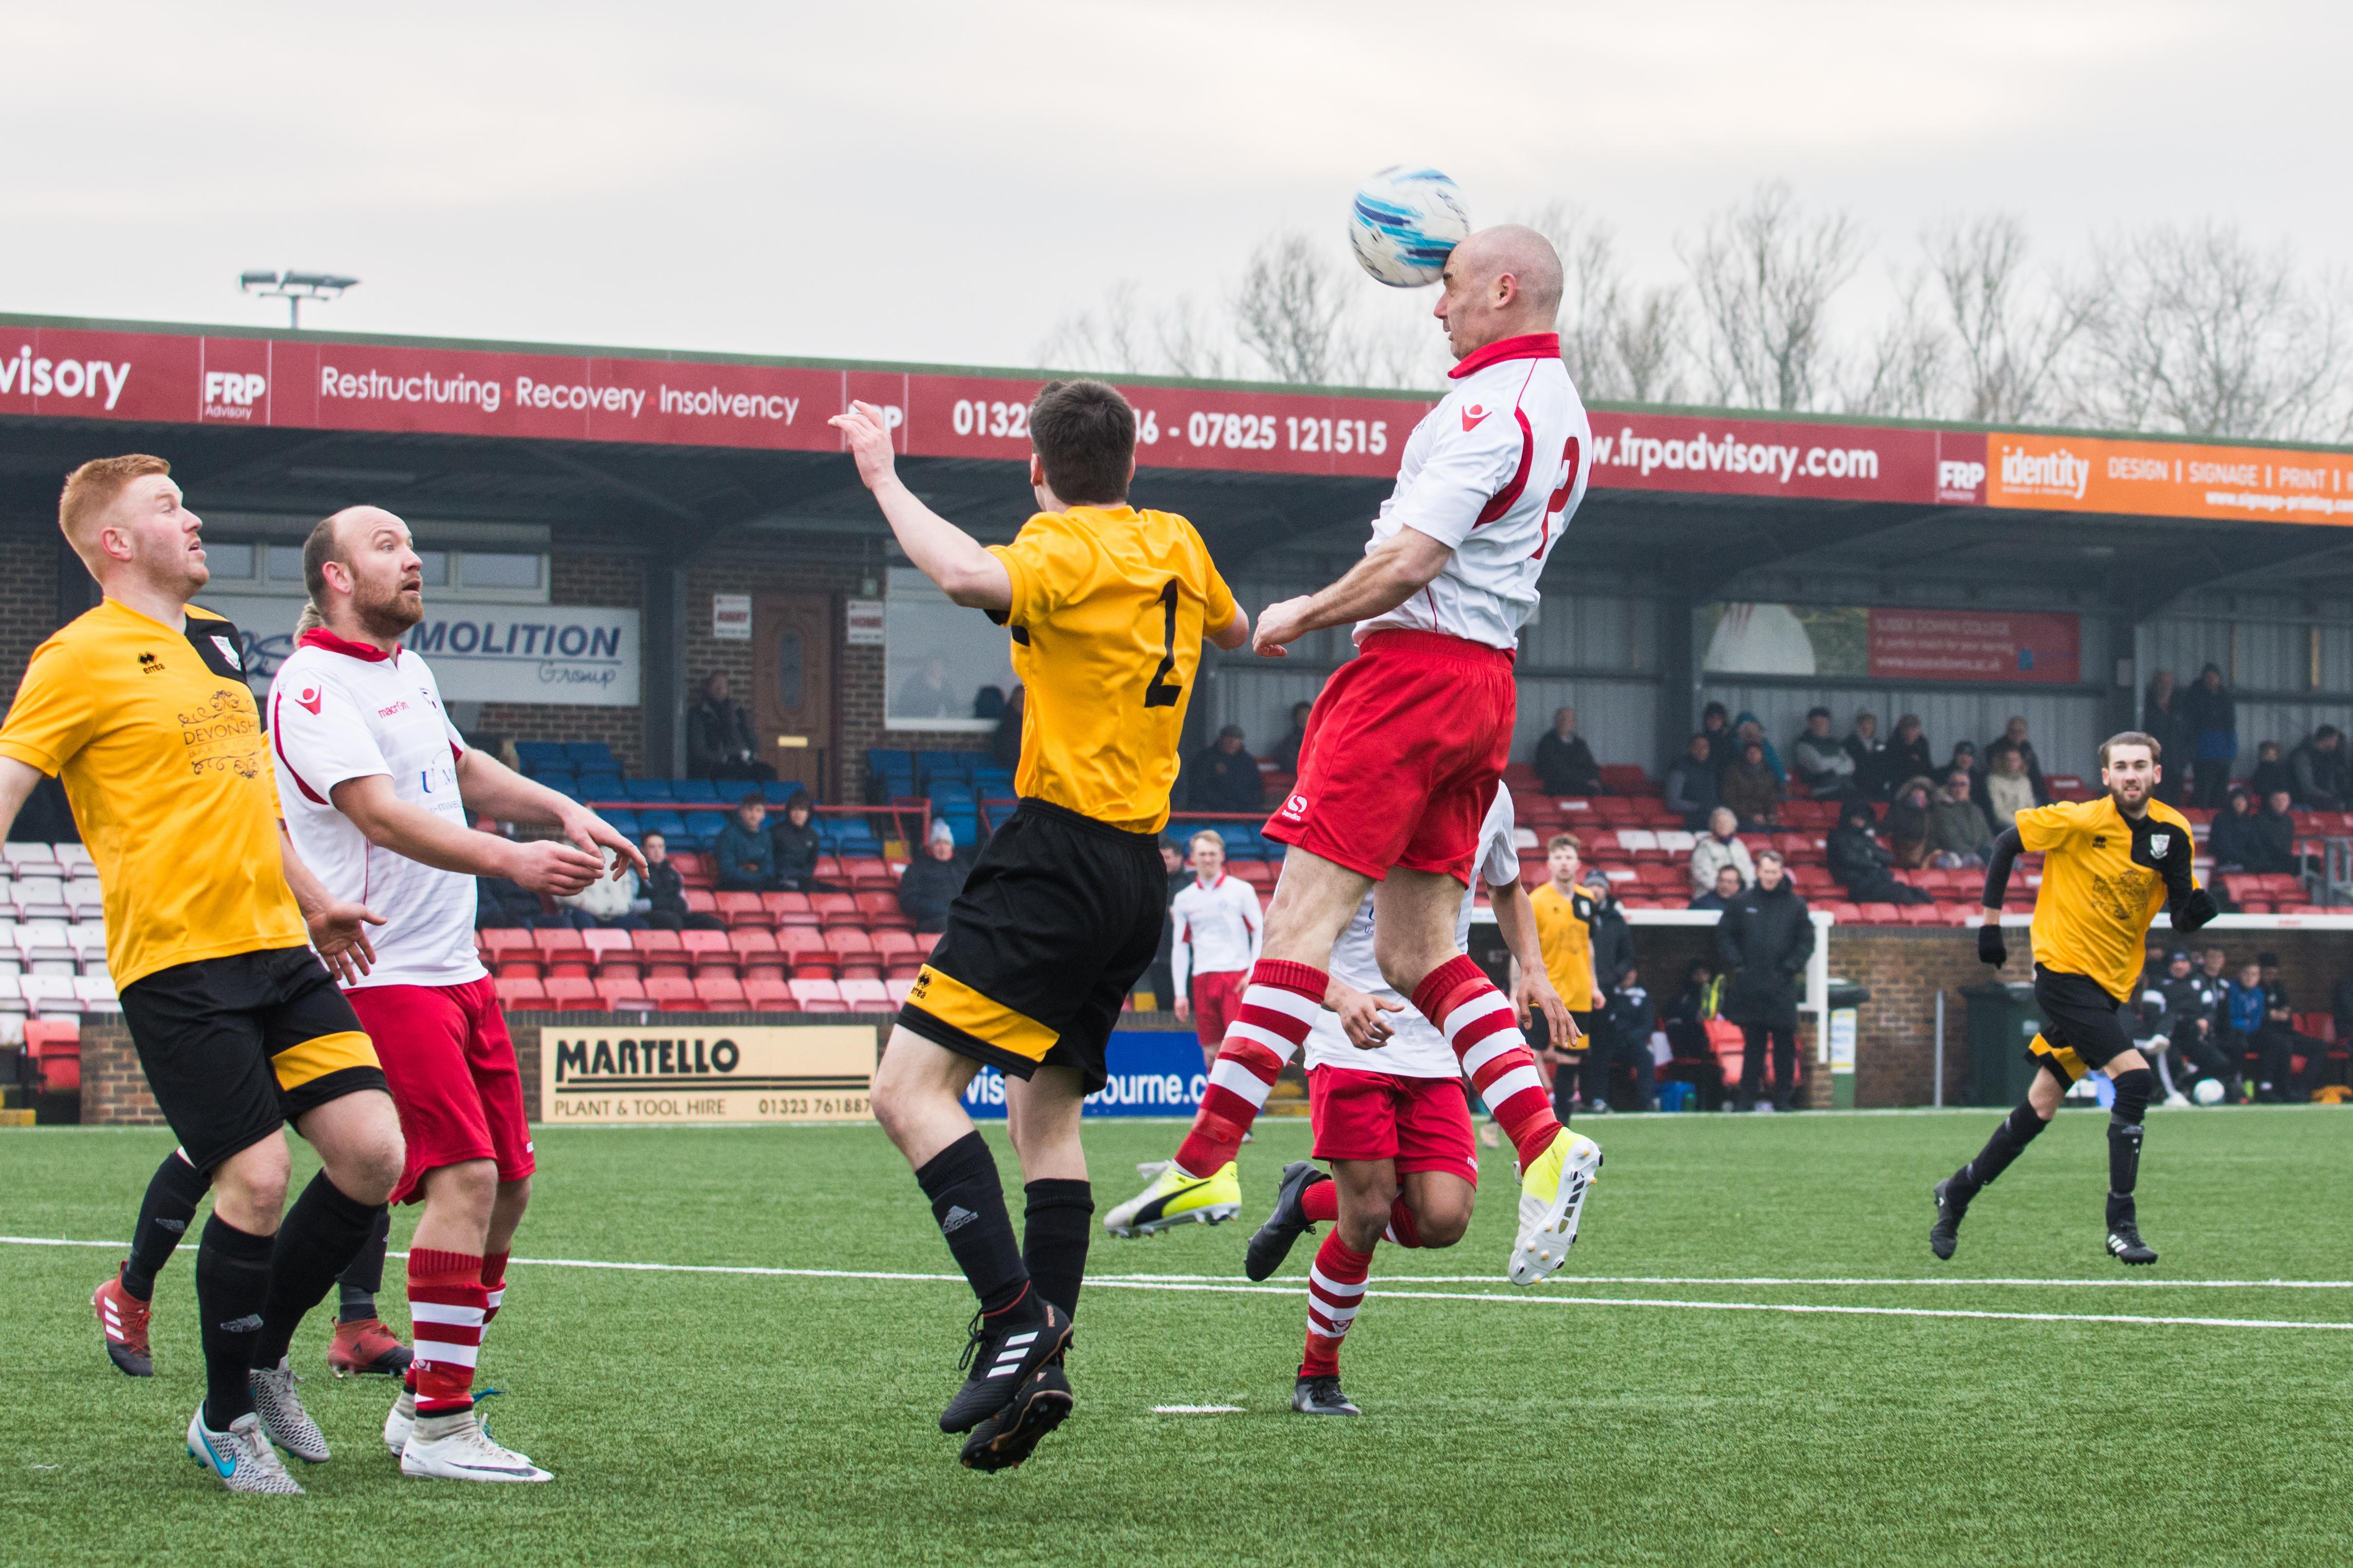 DAVID_JEFFERY Langney Wanderers FC vs Bexhill United FC 03.03.18 31